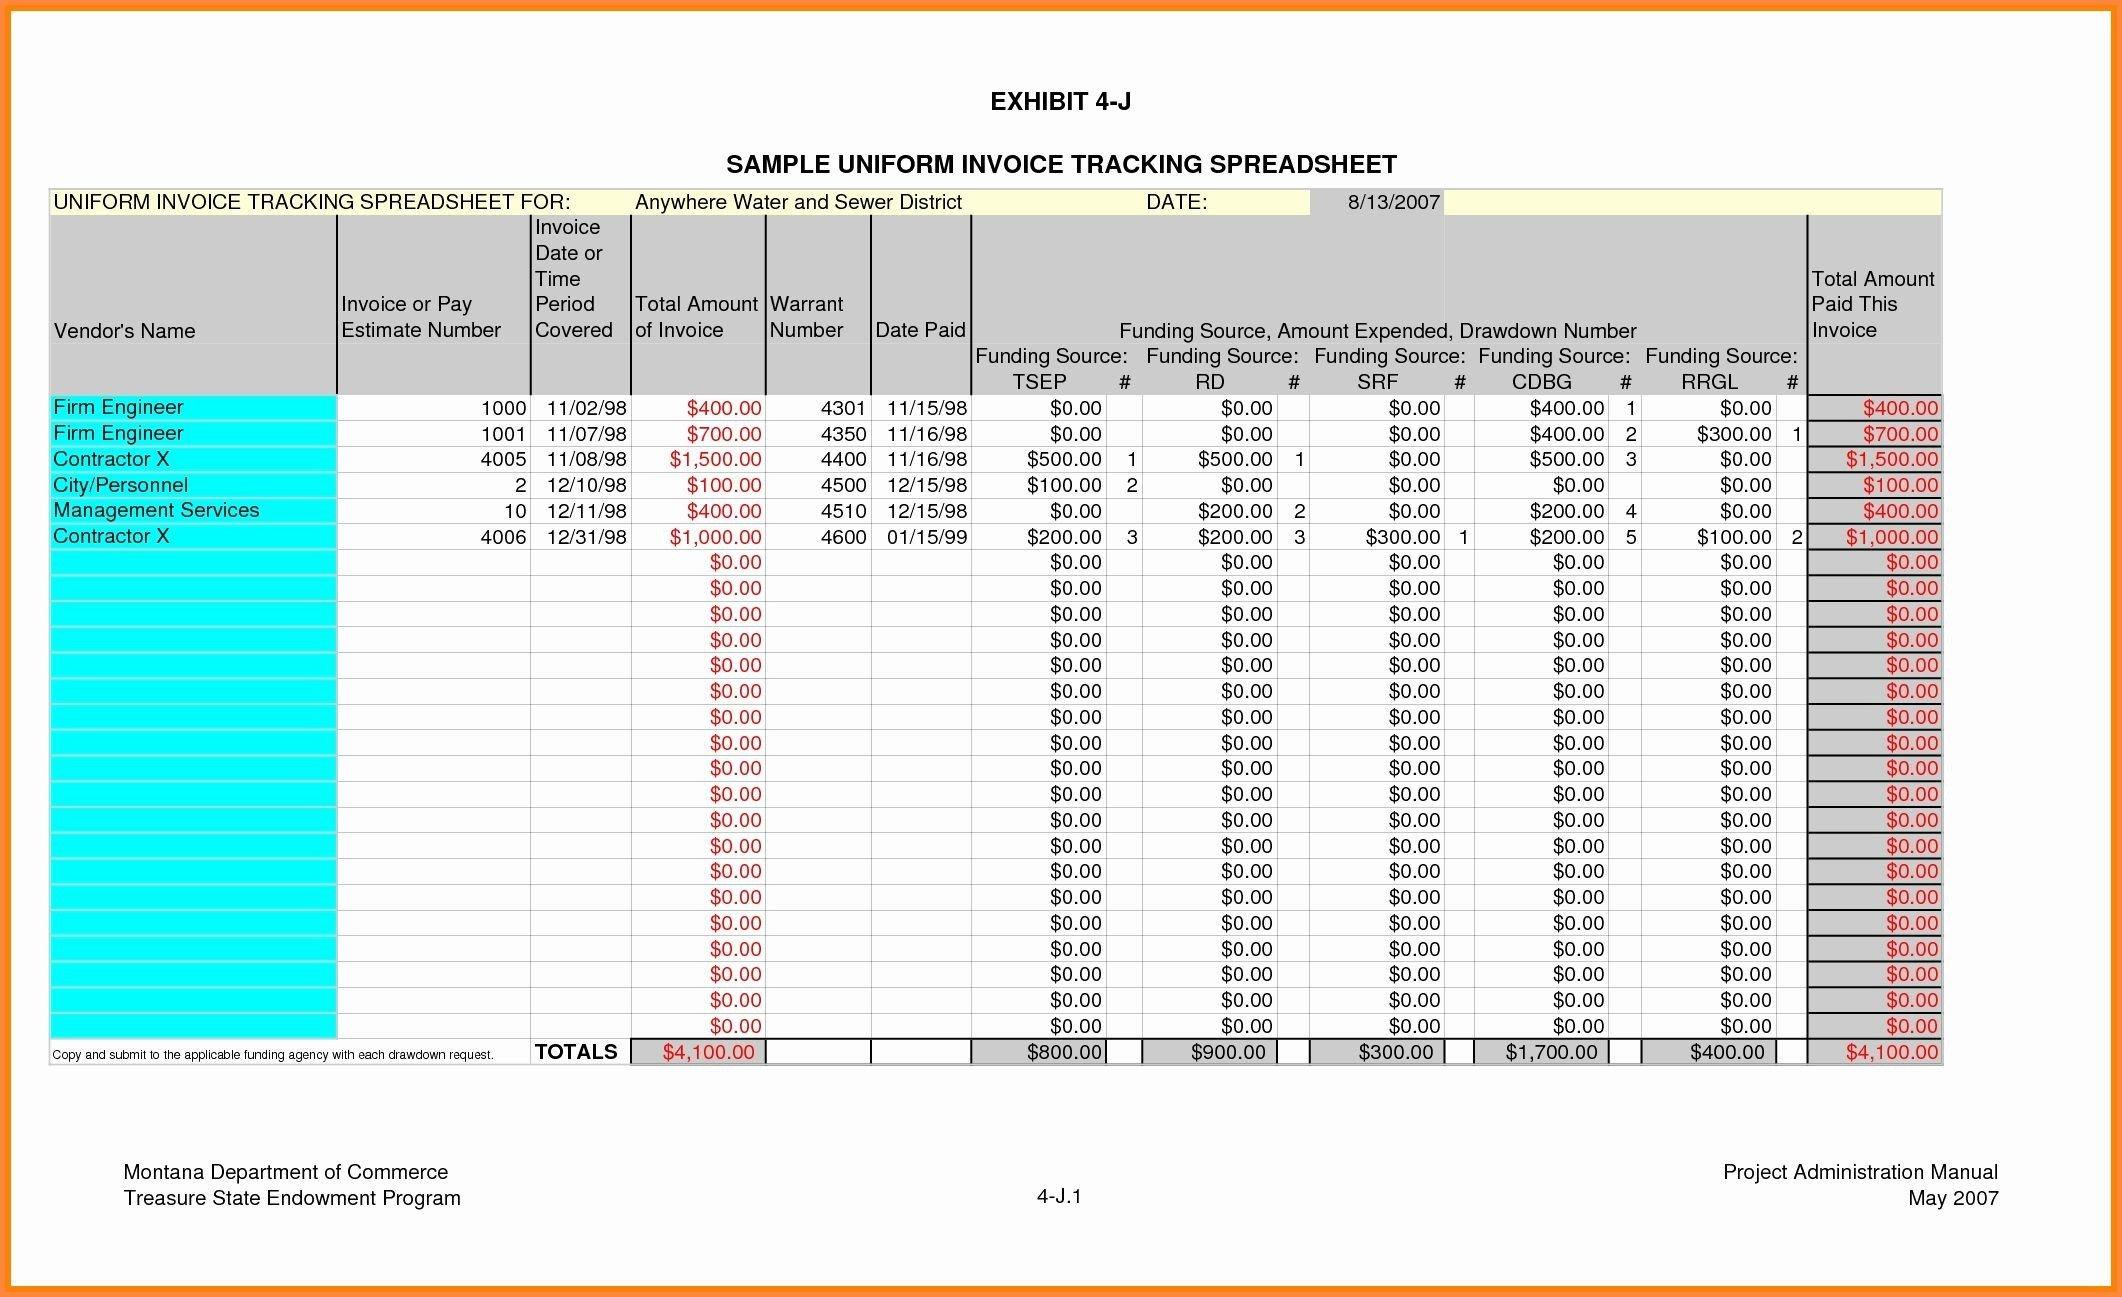 Po Tracking New Po Tracking Spreadsheet Of Inventory Spreadsheet ... Or Per Diem Tracking Spreadsheet